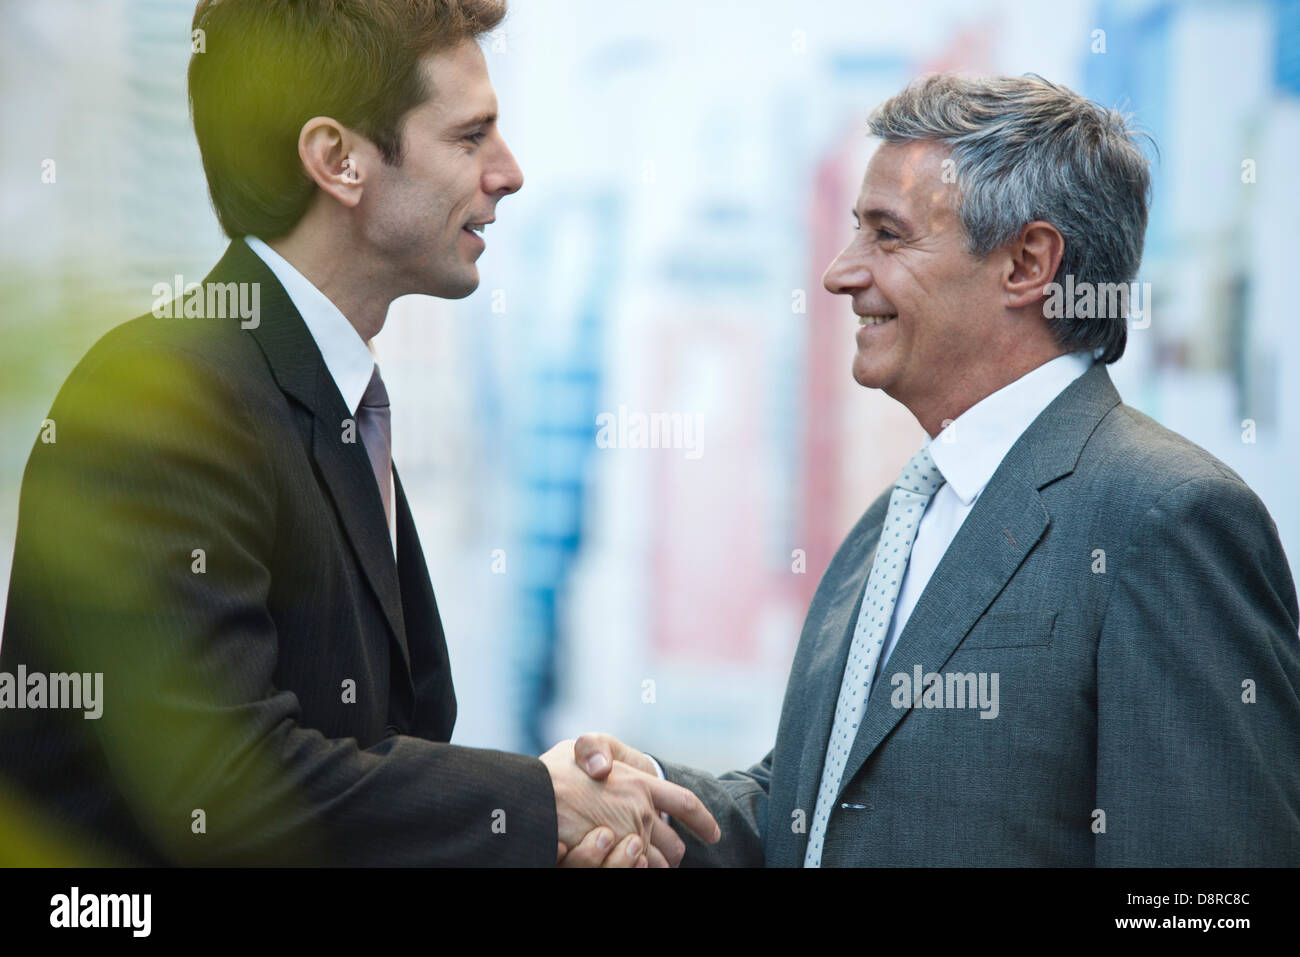 Businessmen shaking hands outdoors - Stock Image